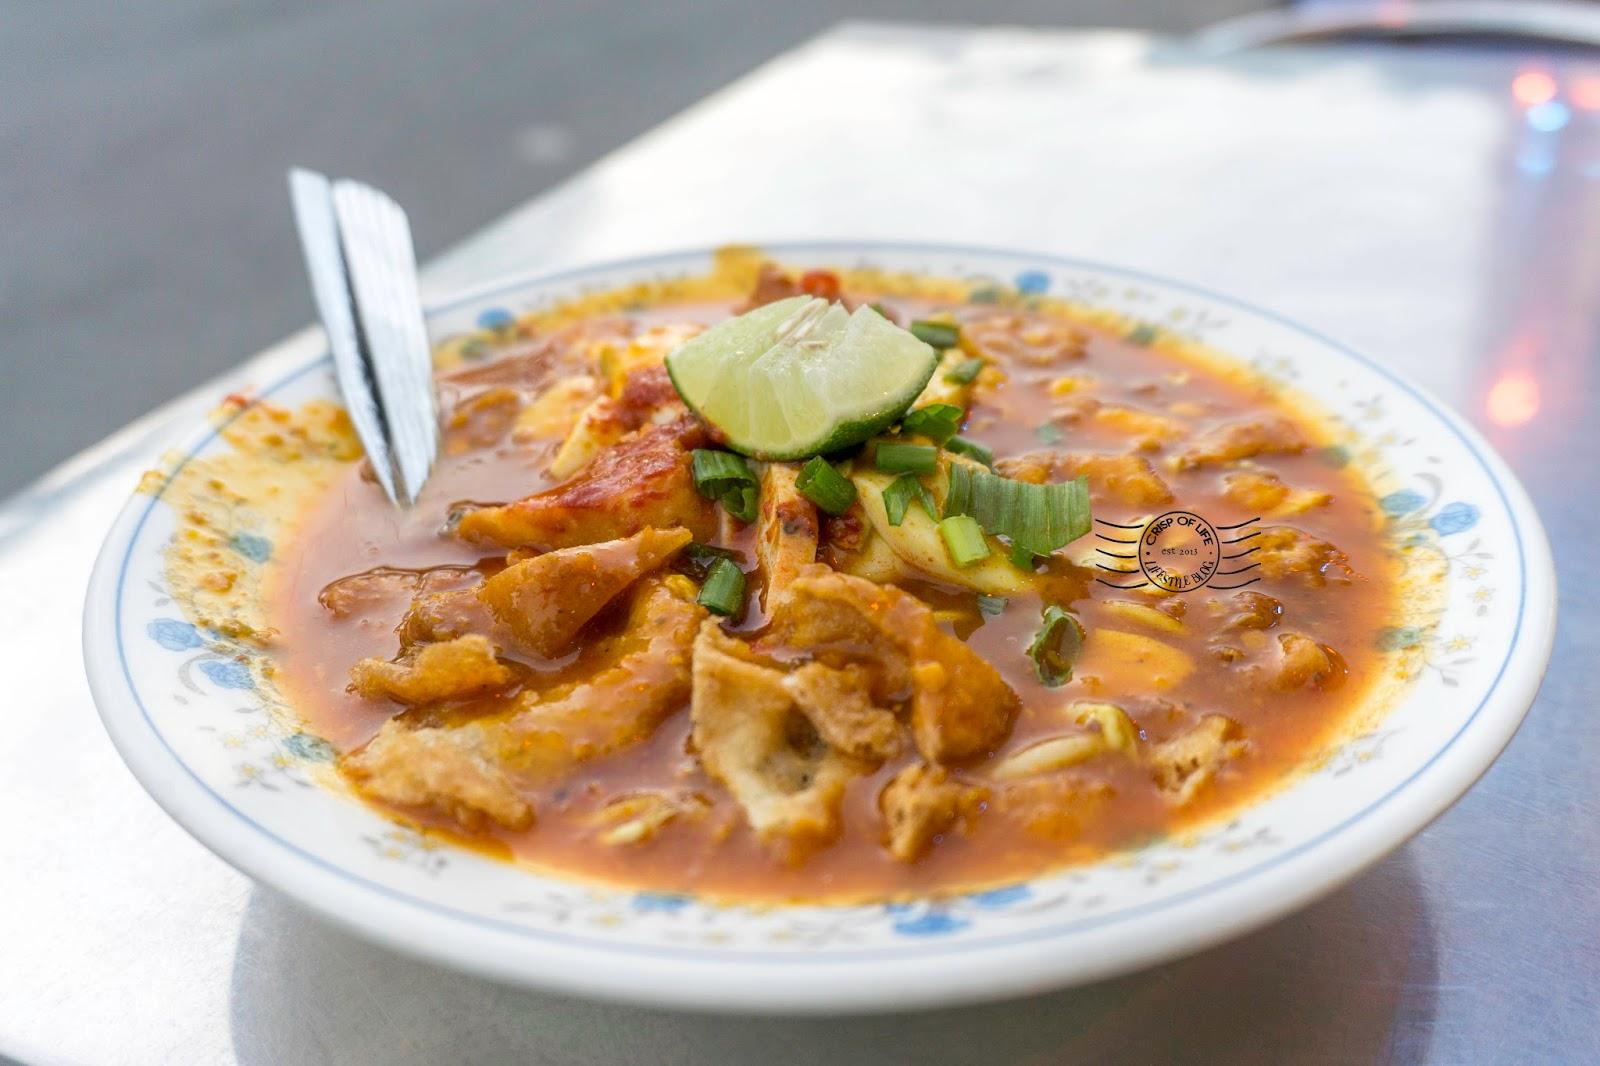 Mikamal Restaurant Alor Setar Mee Goreng Mee Rebus